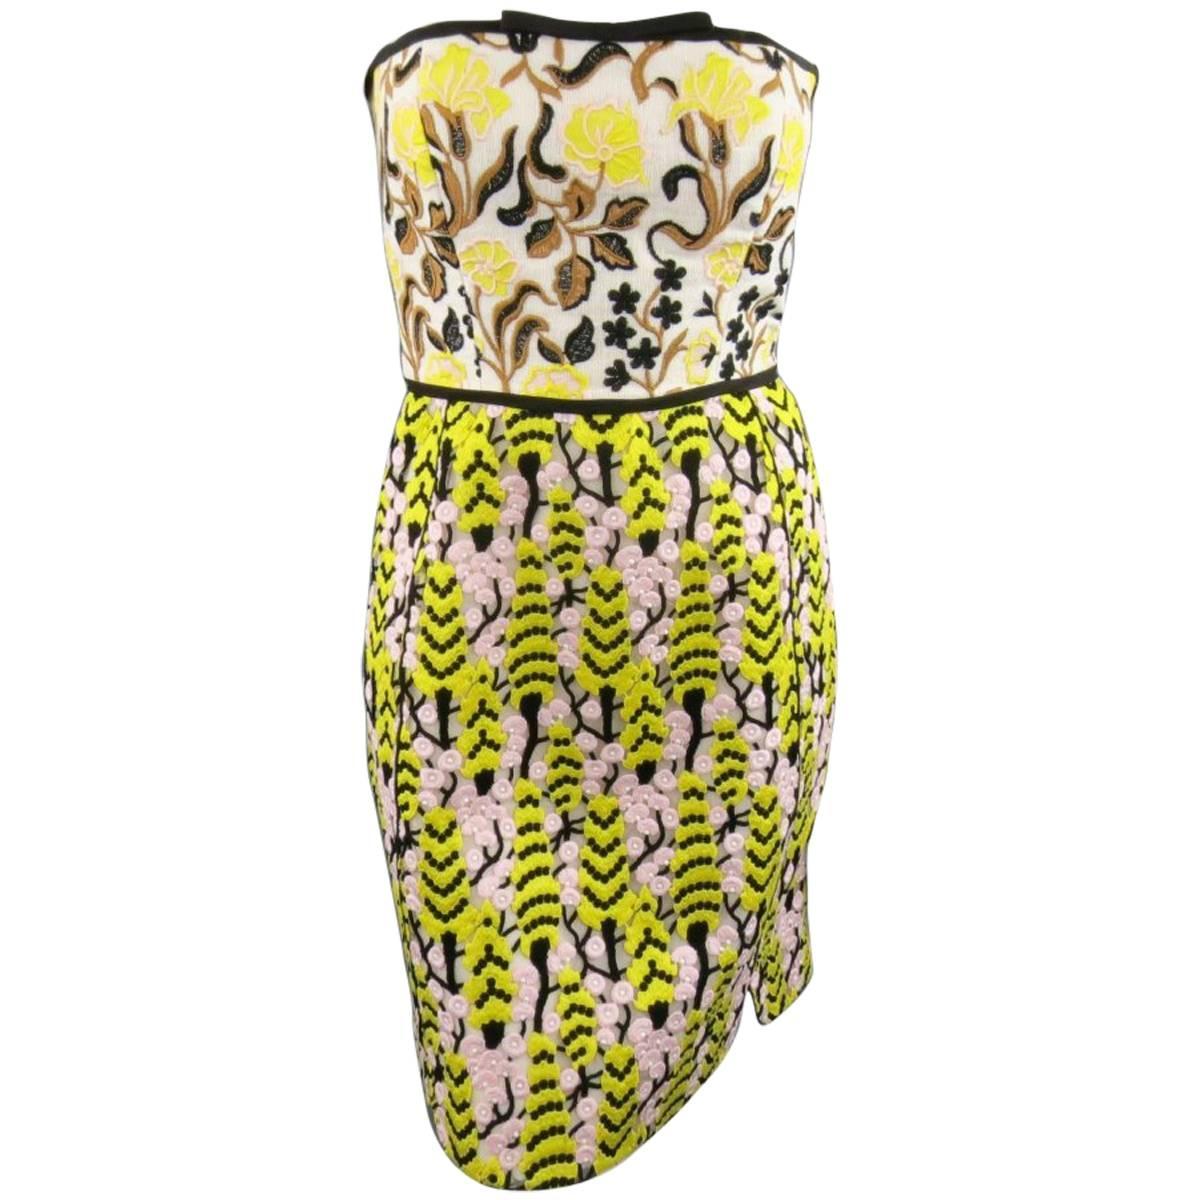 Giambattista Valli Yellow Pink Beige Linen and Lace Strapless Cocktail Dress